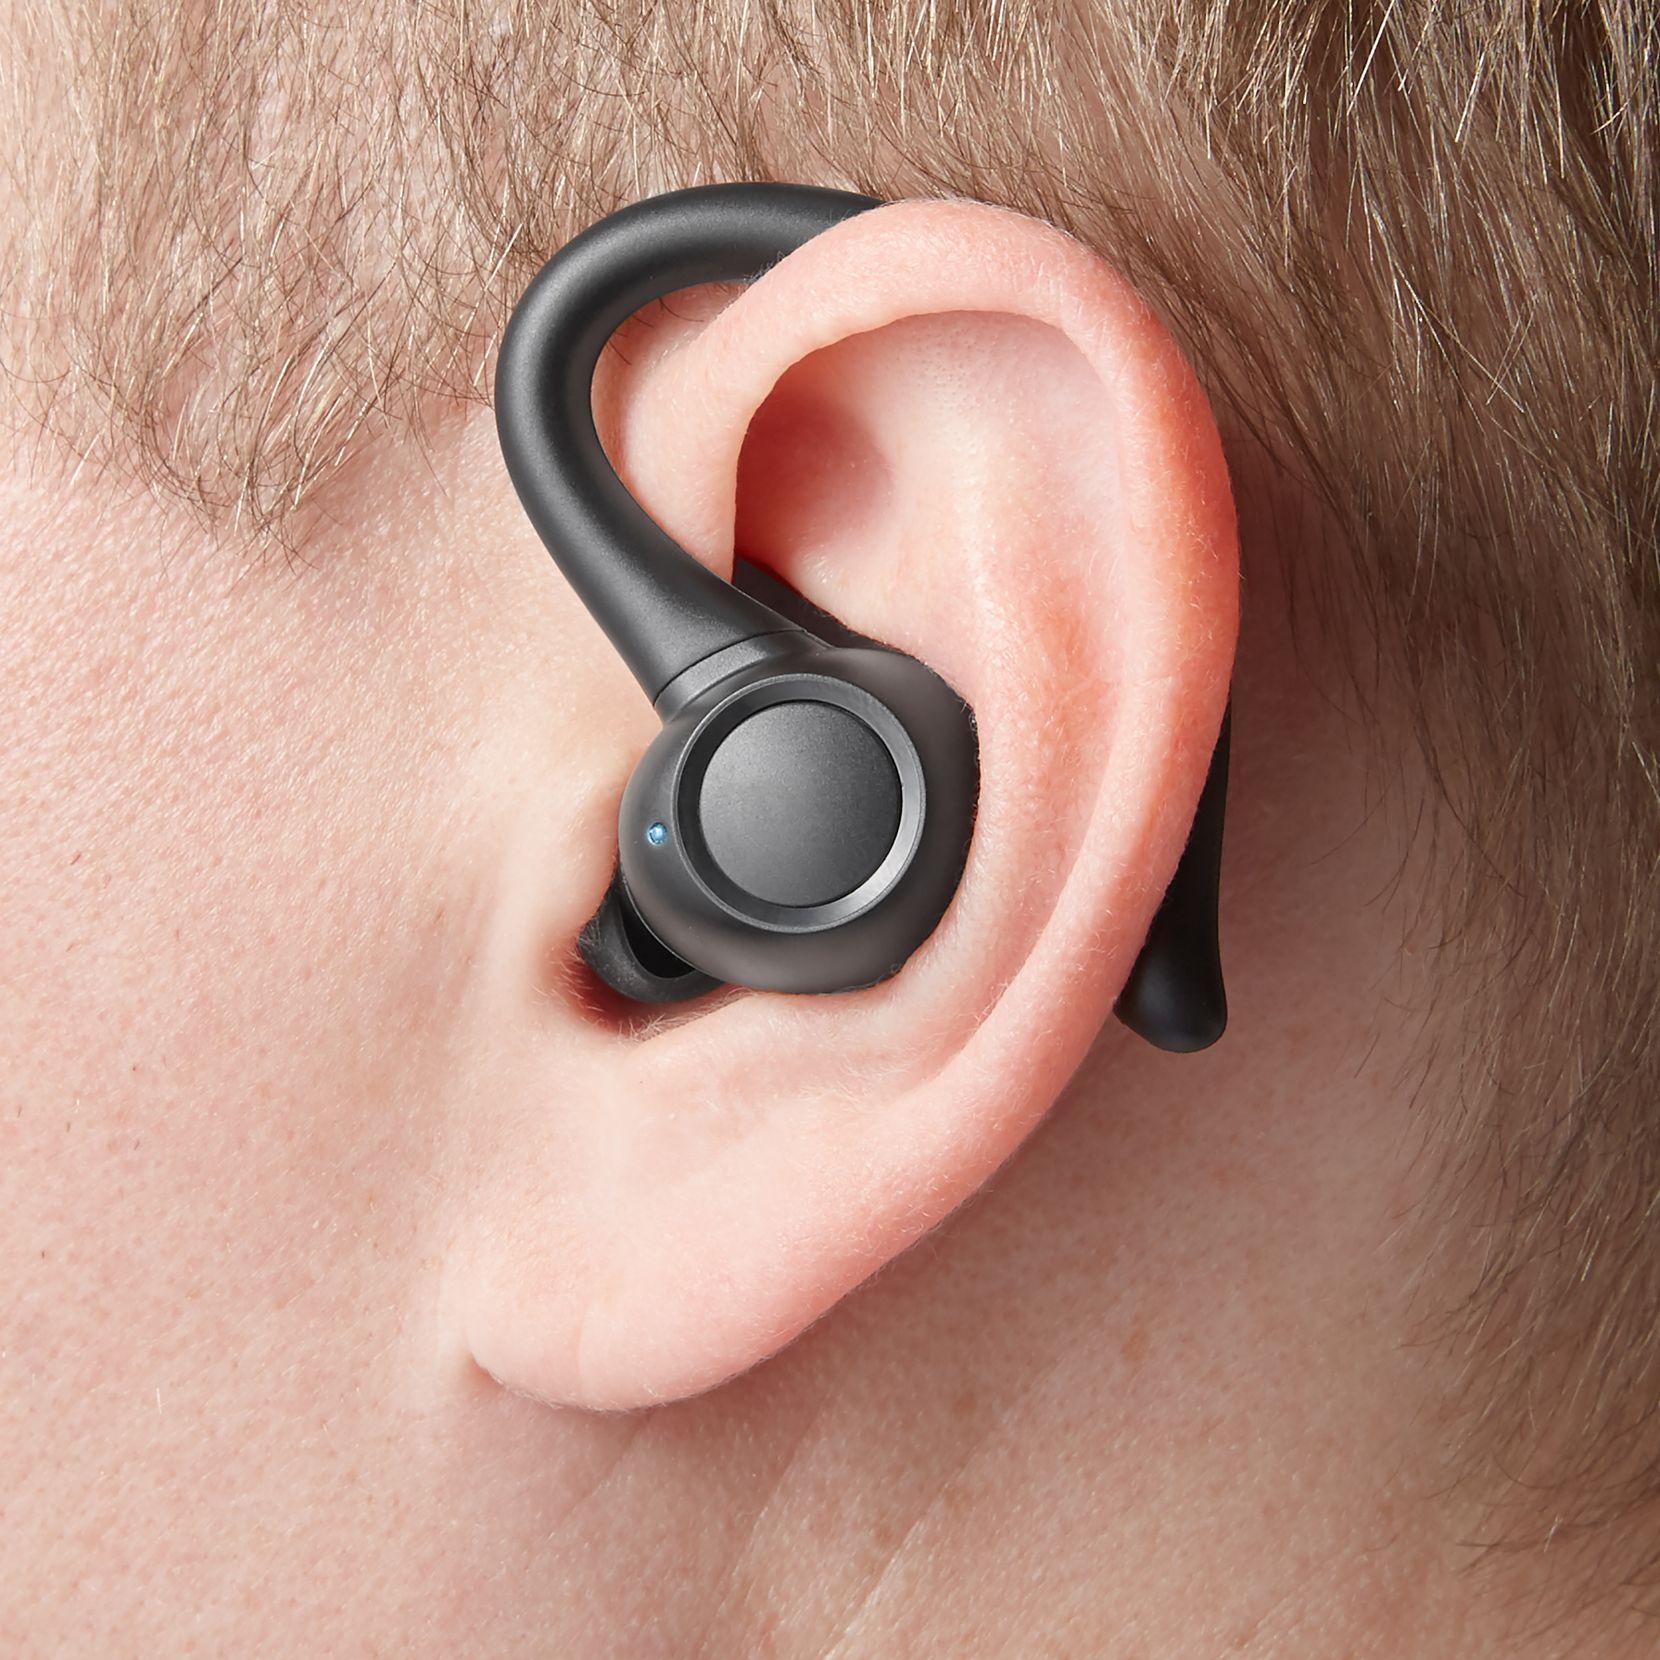 The Blackweb True Wireless Bluetooth Earbuds.